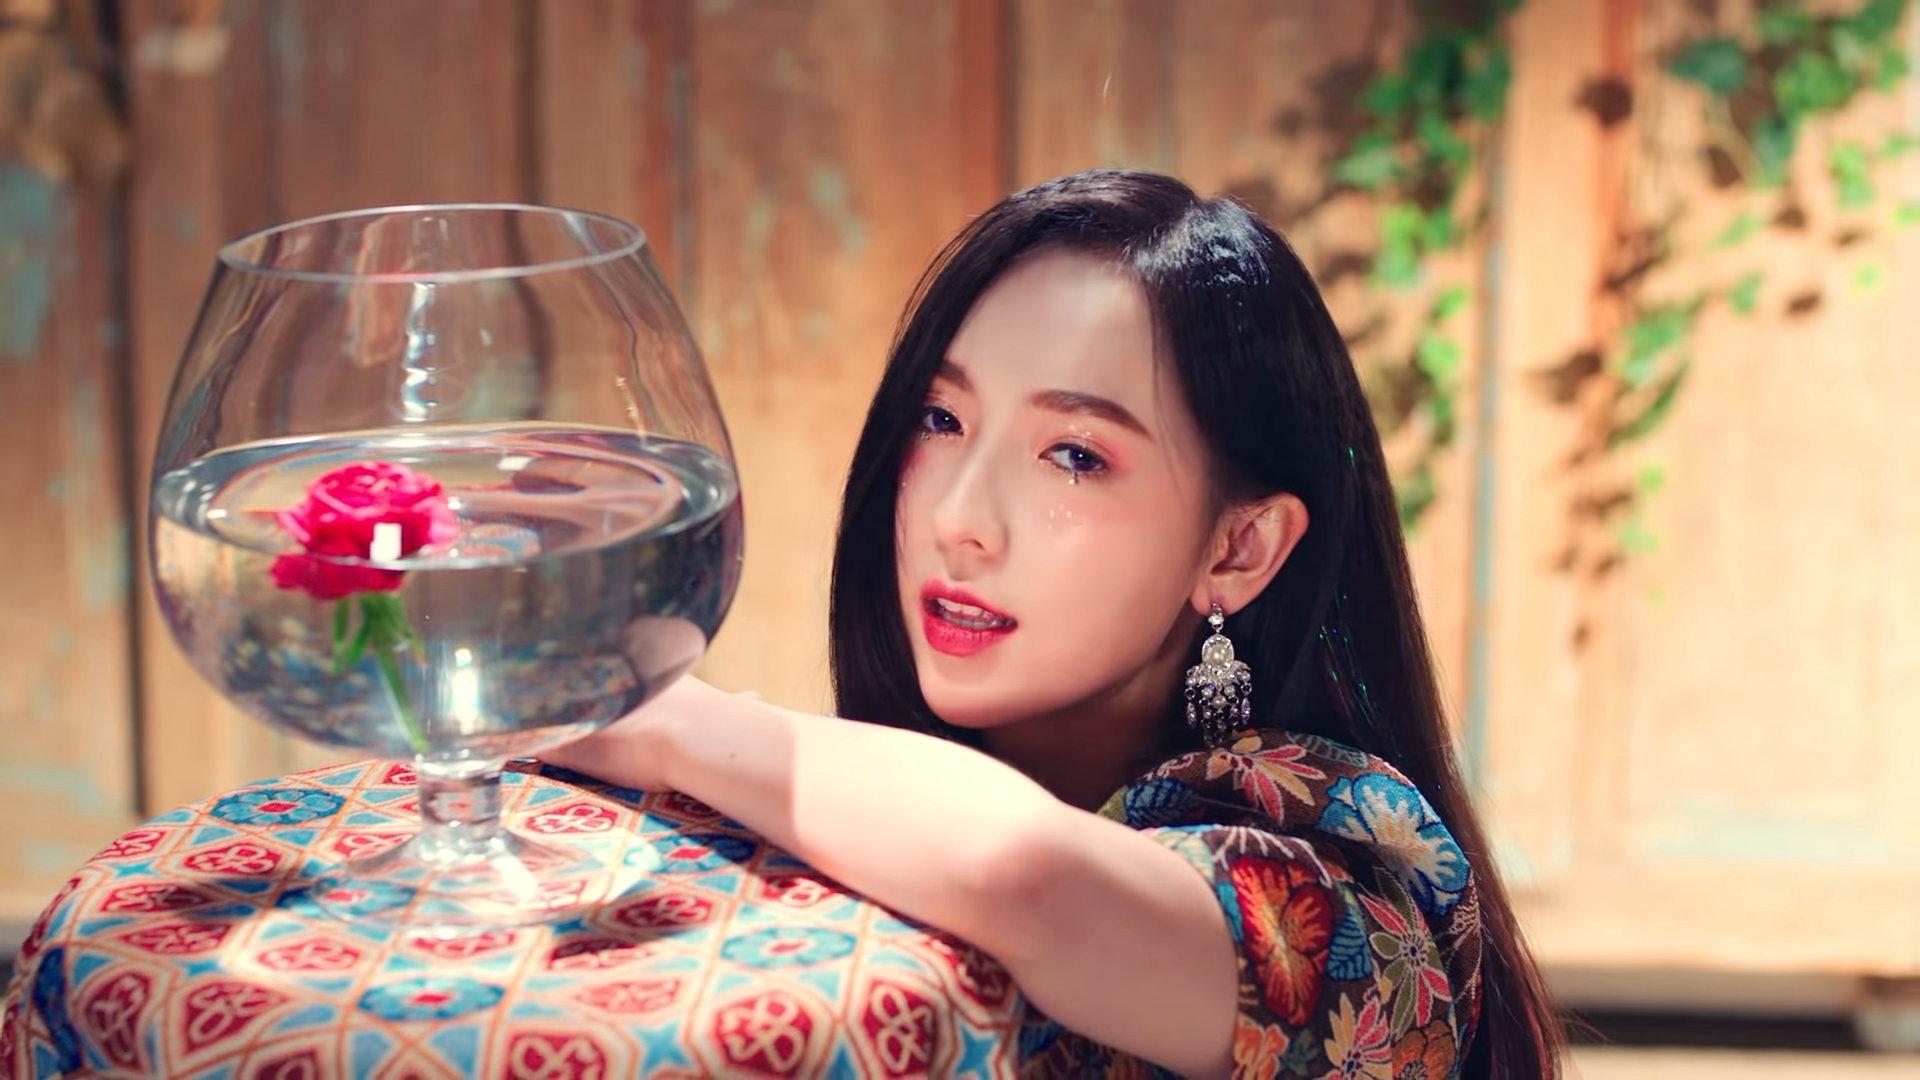 HUB Seoryeong